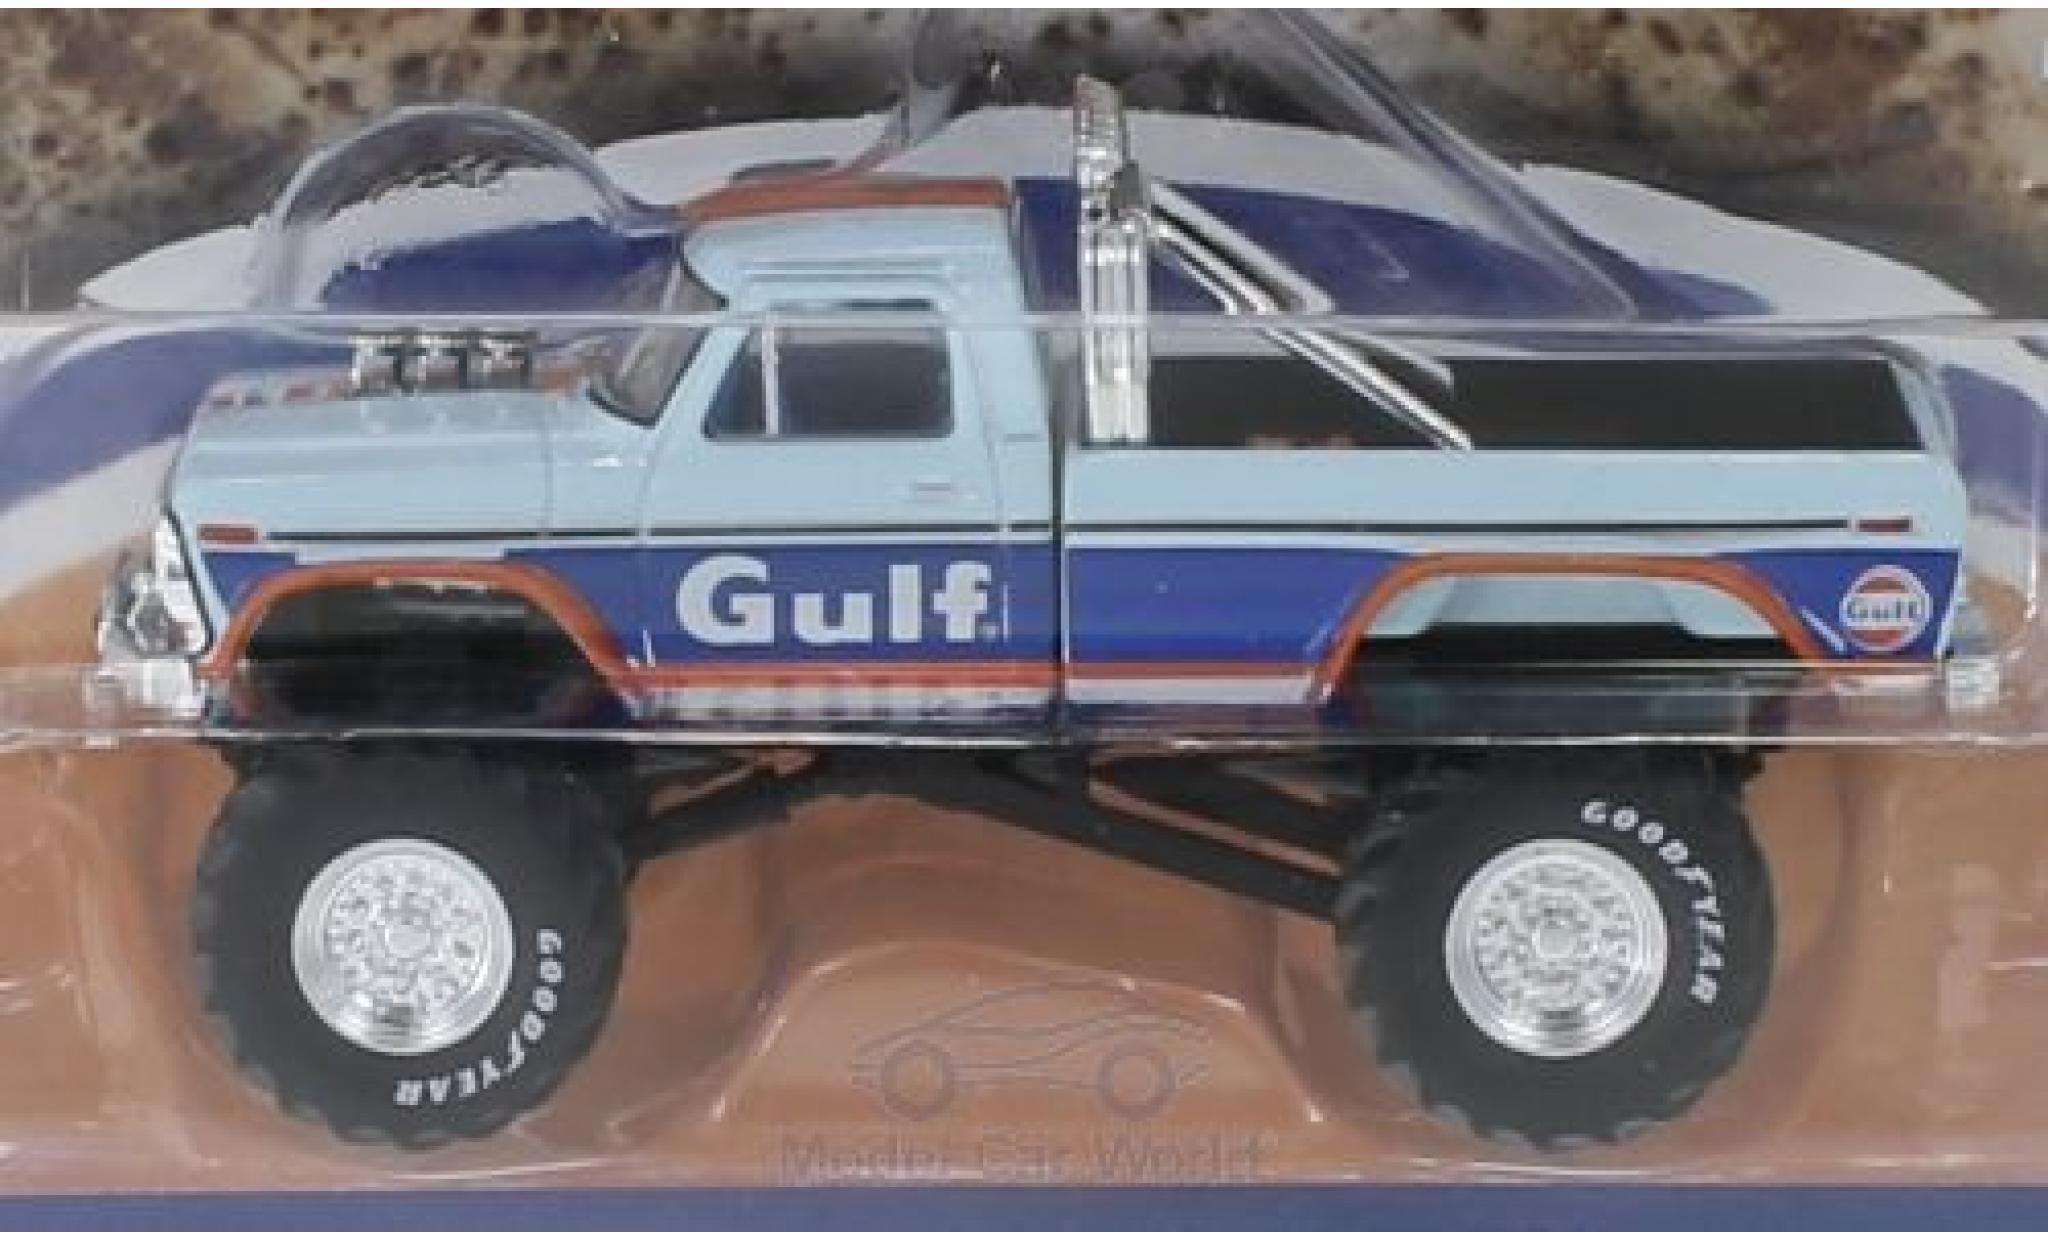 Ford F-250 1/64 Greenlight Monster Truck Gulf